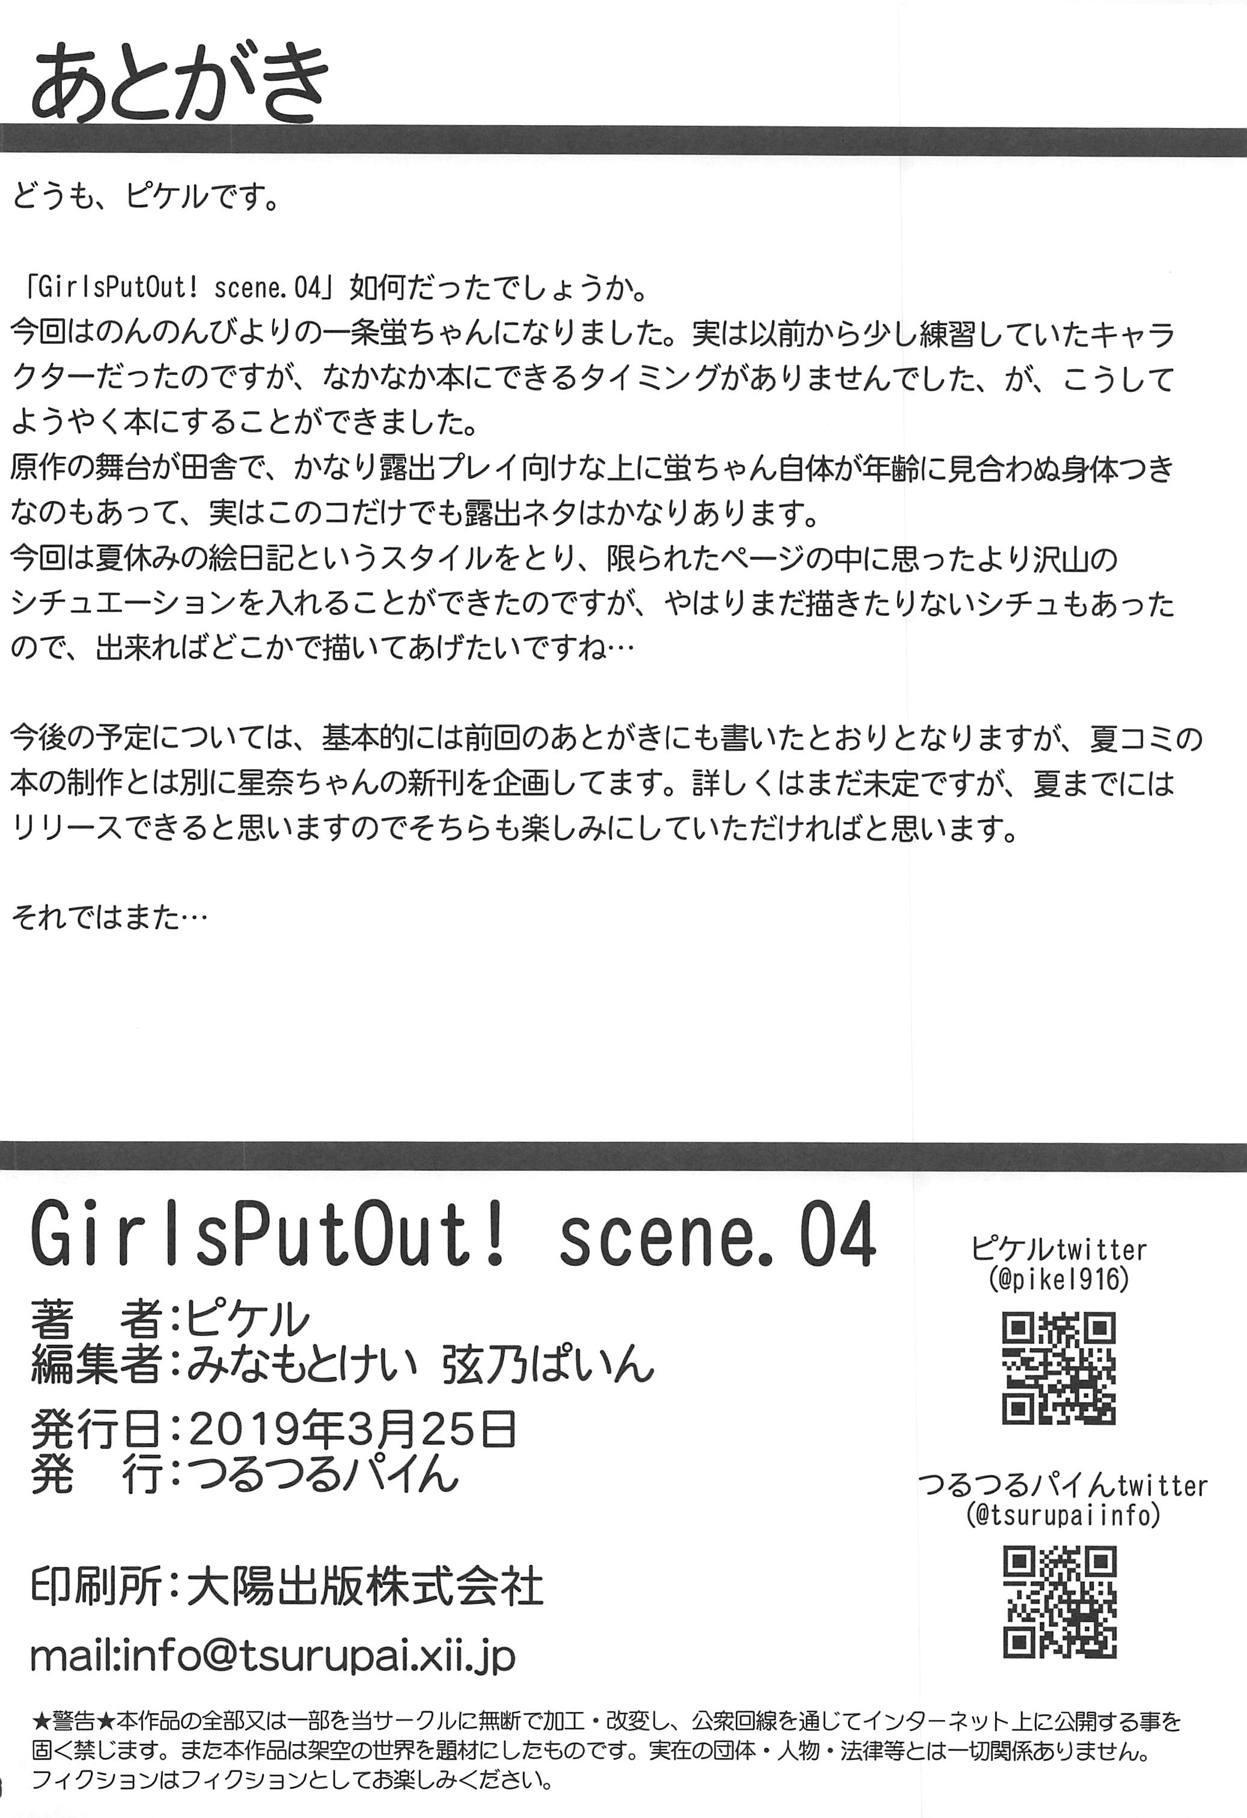 GirlsPutOut! scene.04 14